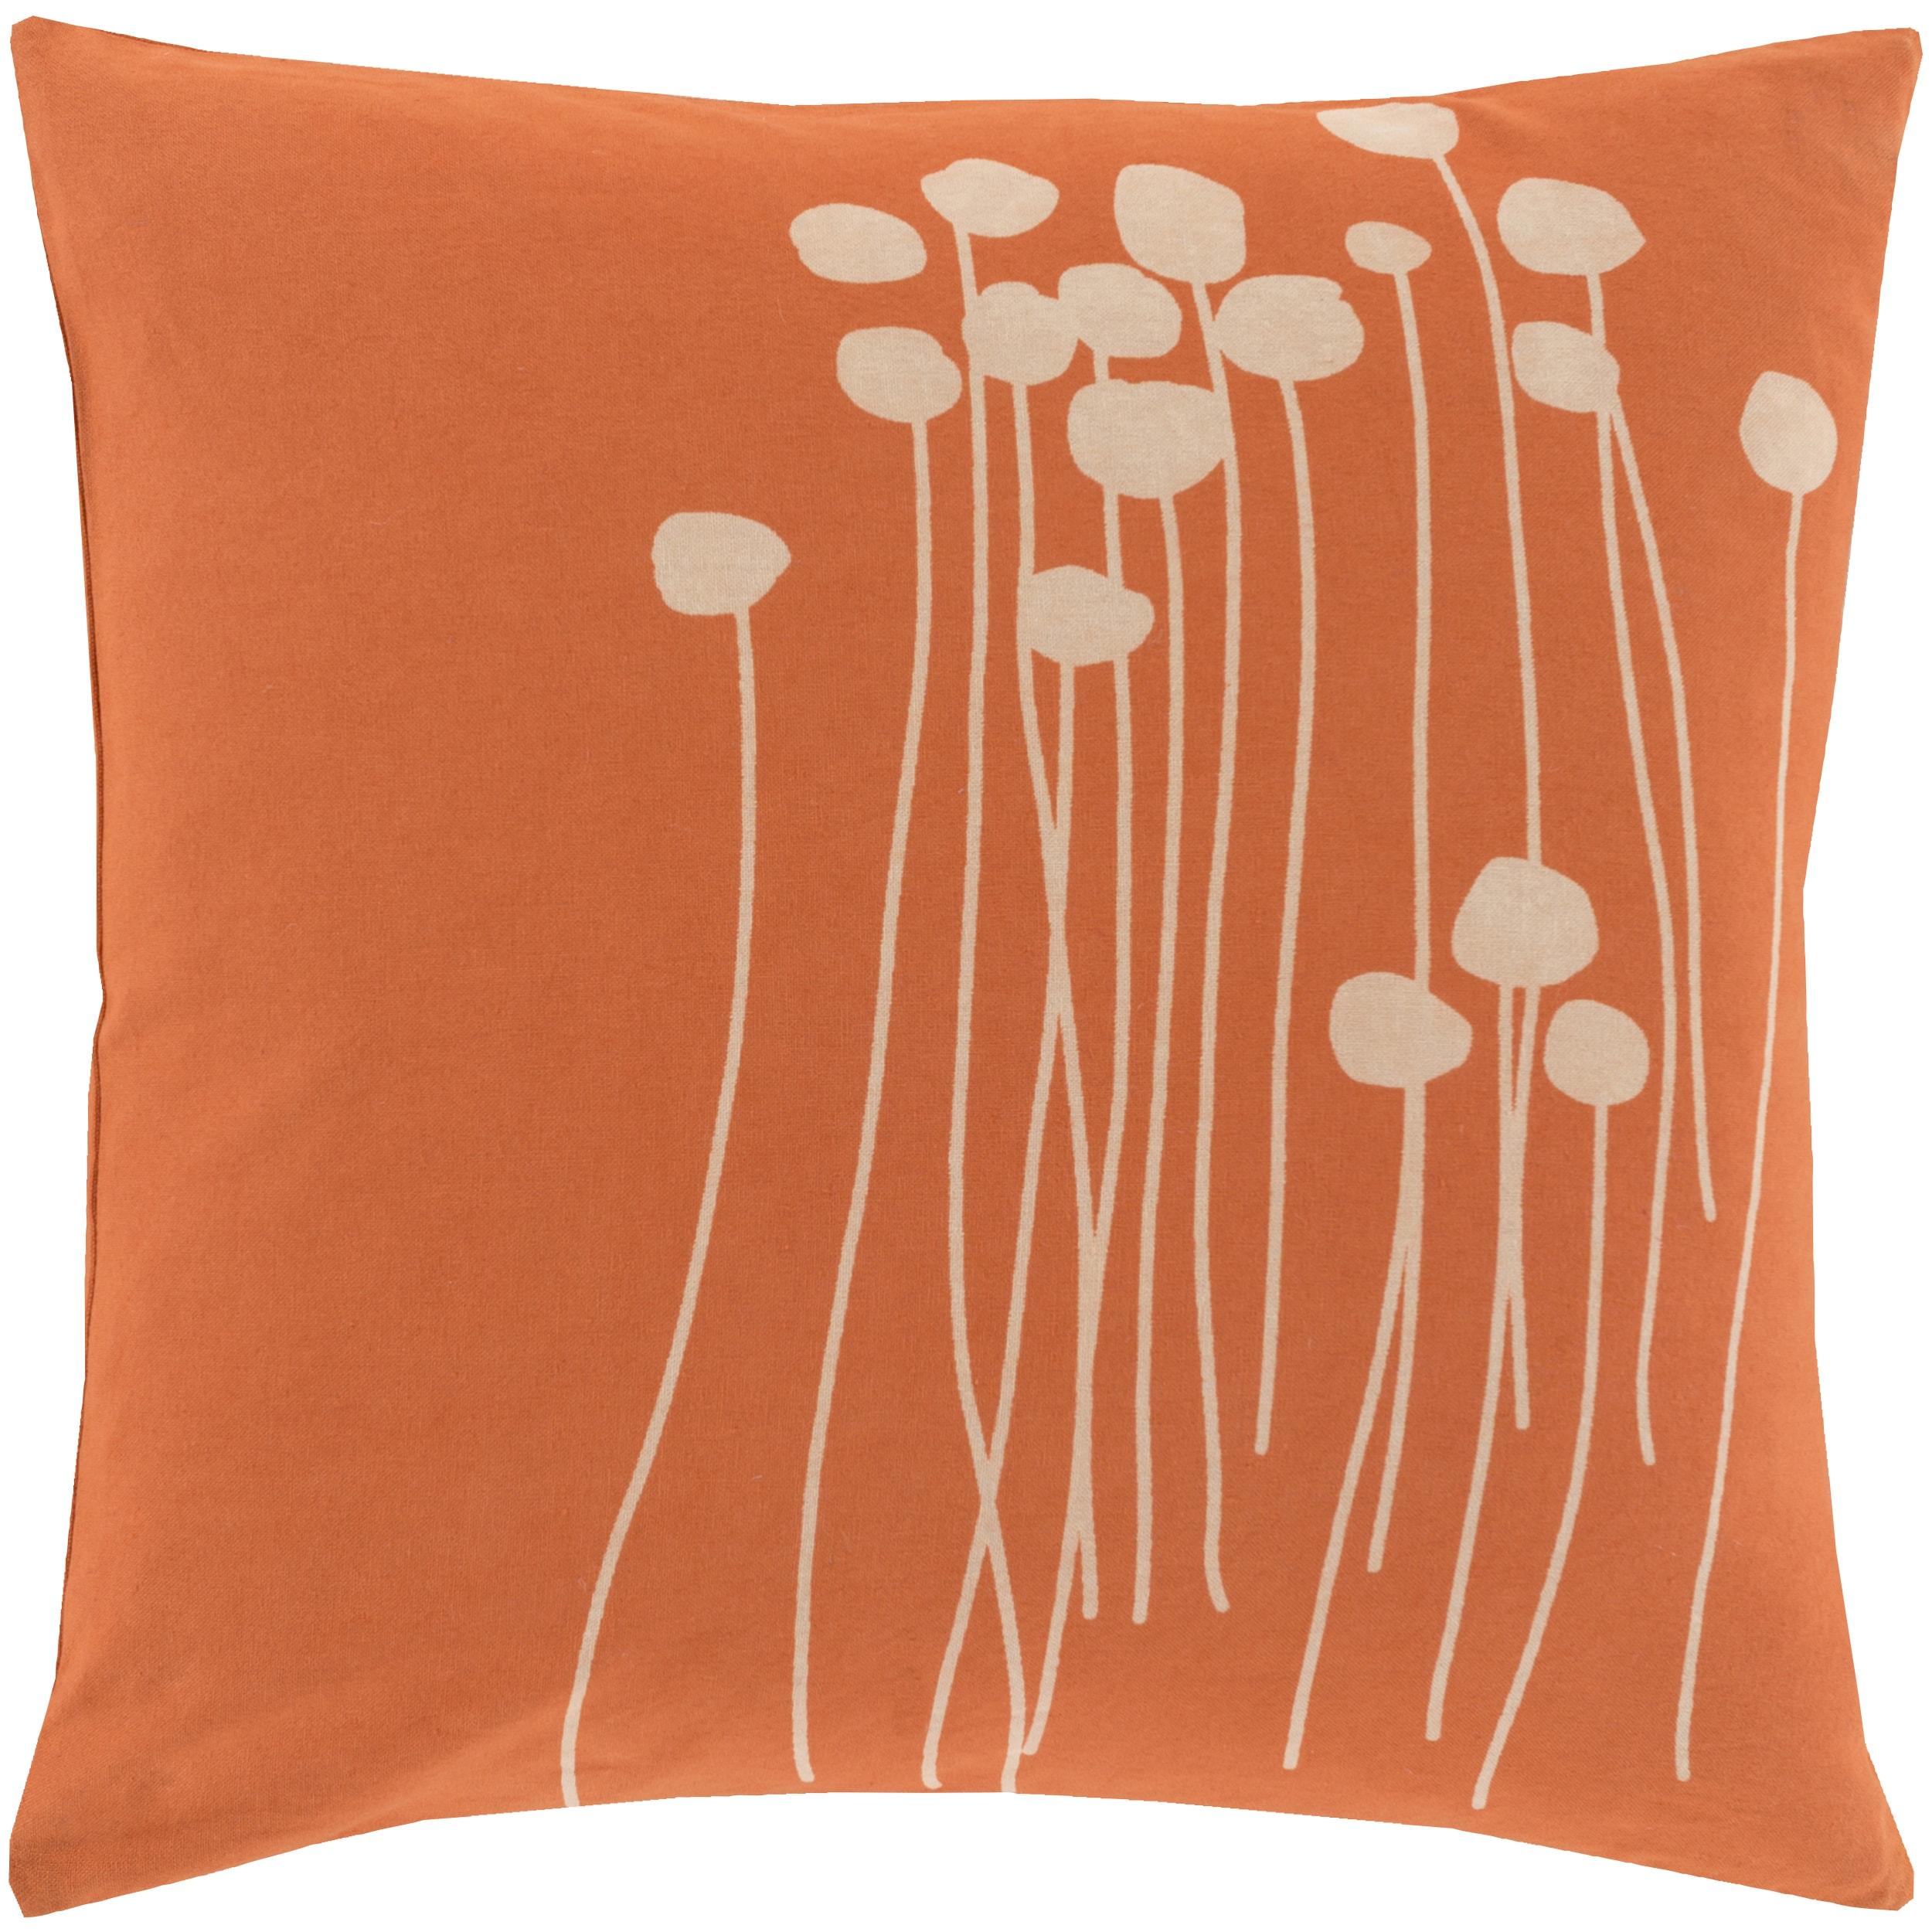 Copper Grove Anamalai 18-inch Orange Floral Throw Pillow